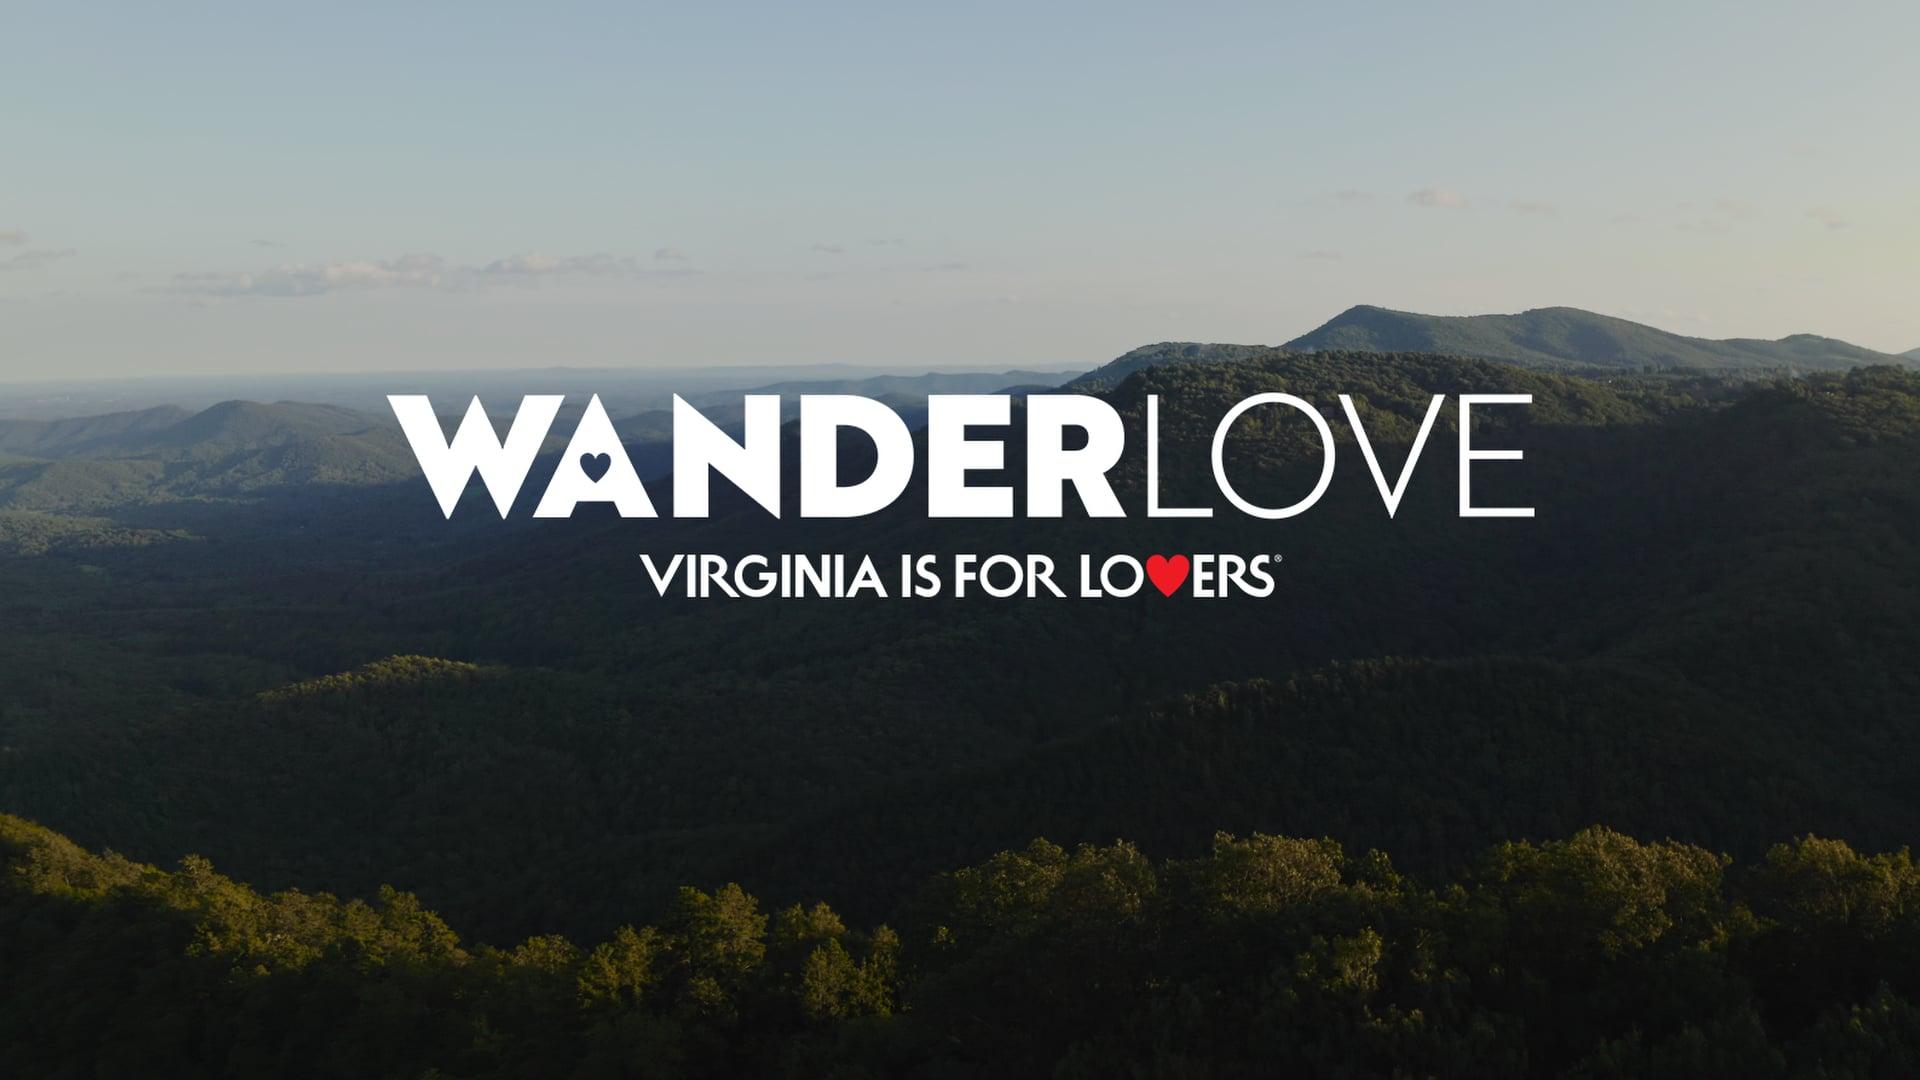 Galax, Virginia - WanderLove